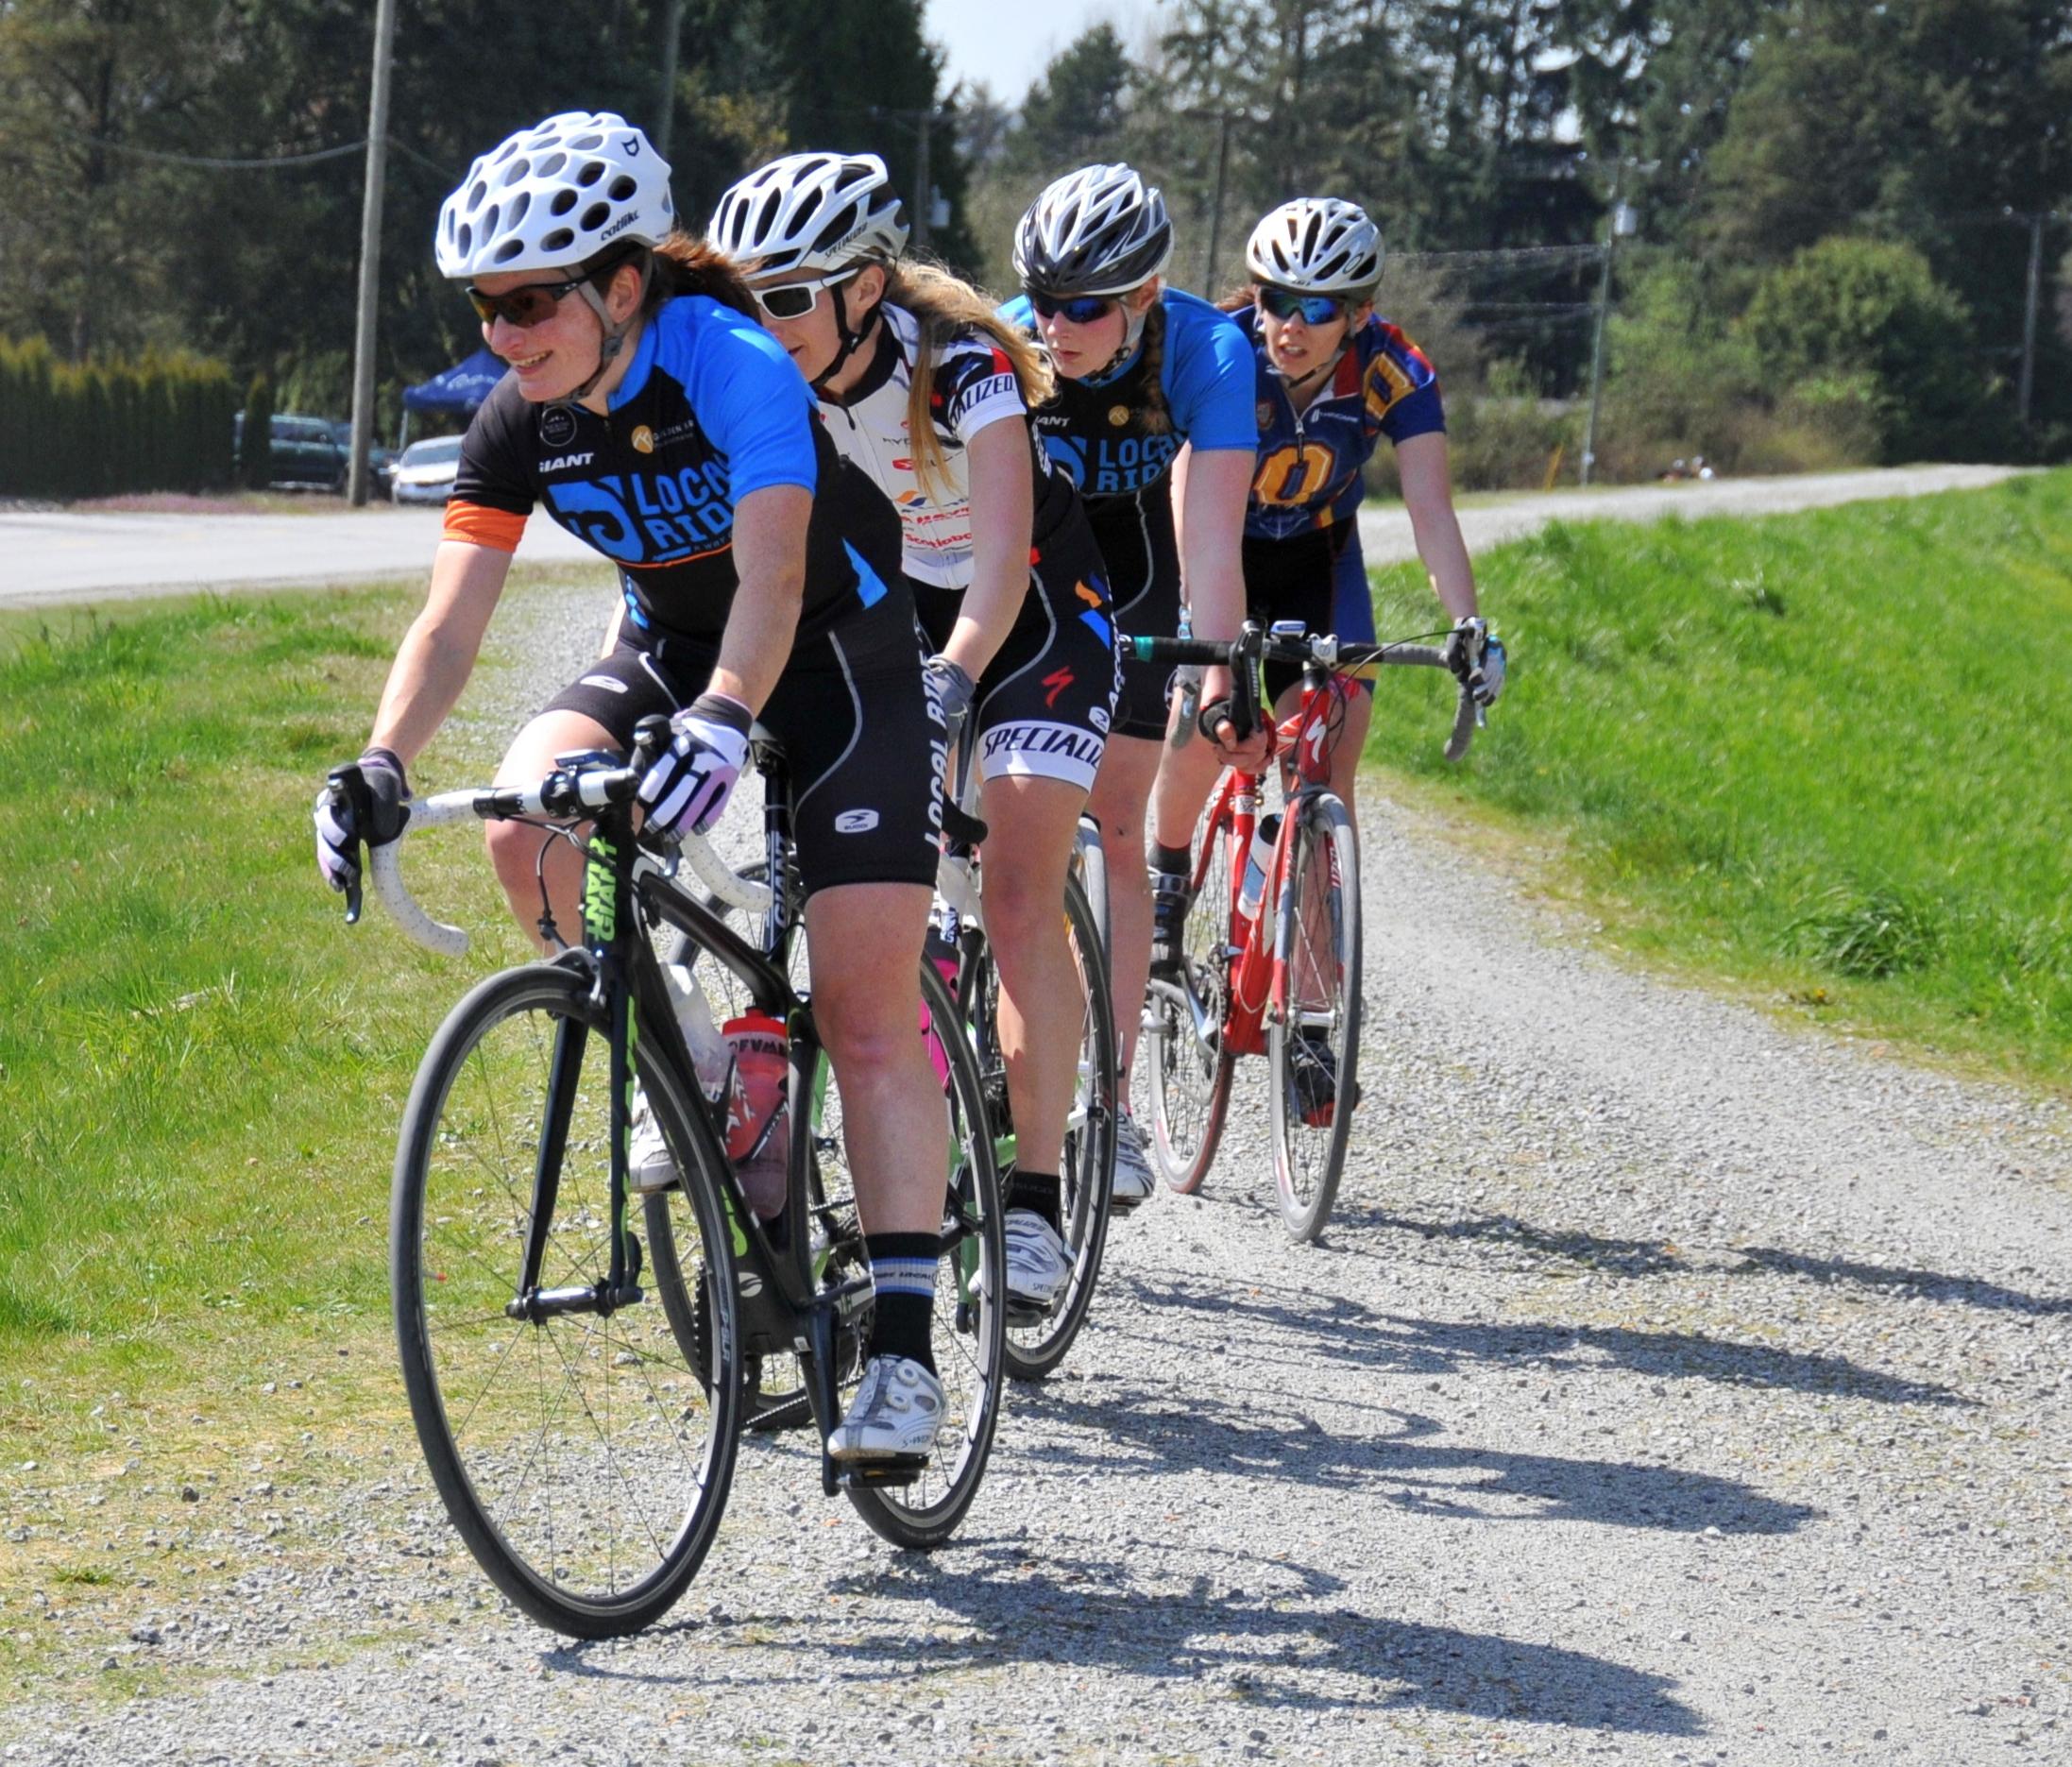 Sandra Walter of Local Ride Racing leads the women's field on the dyke. Photo: Susan Weston